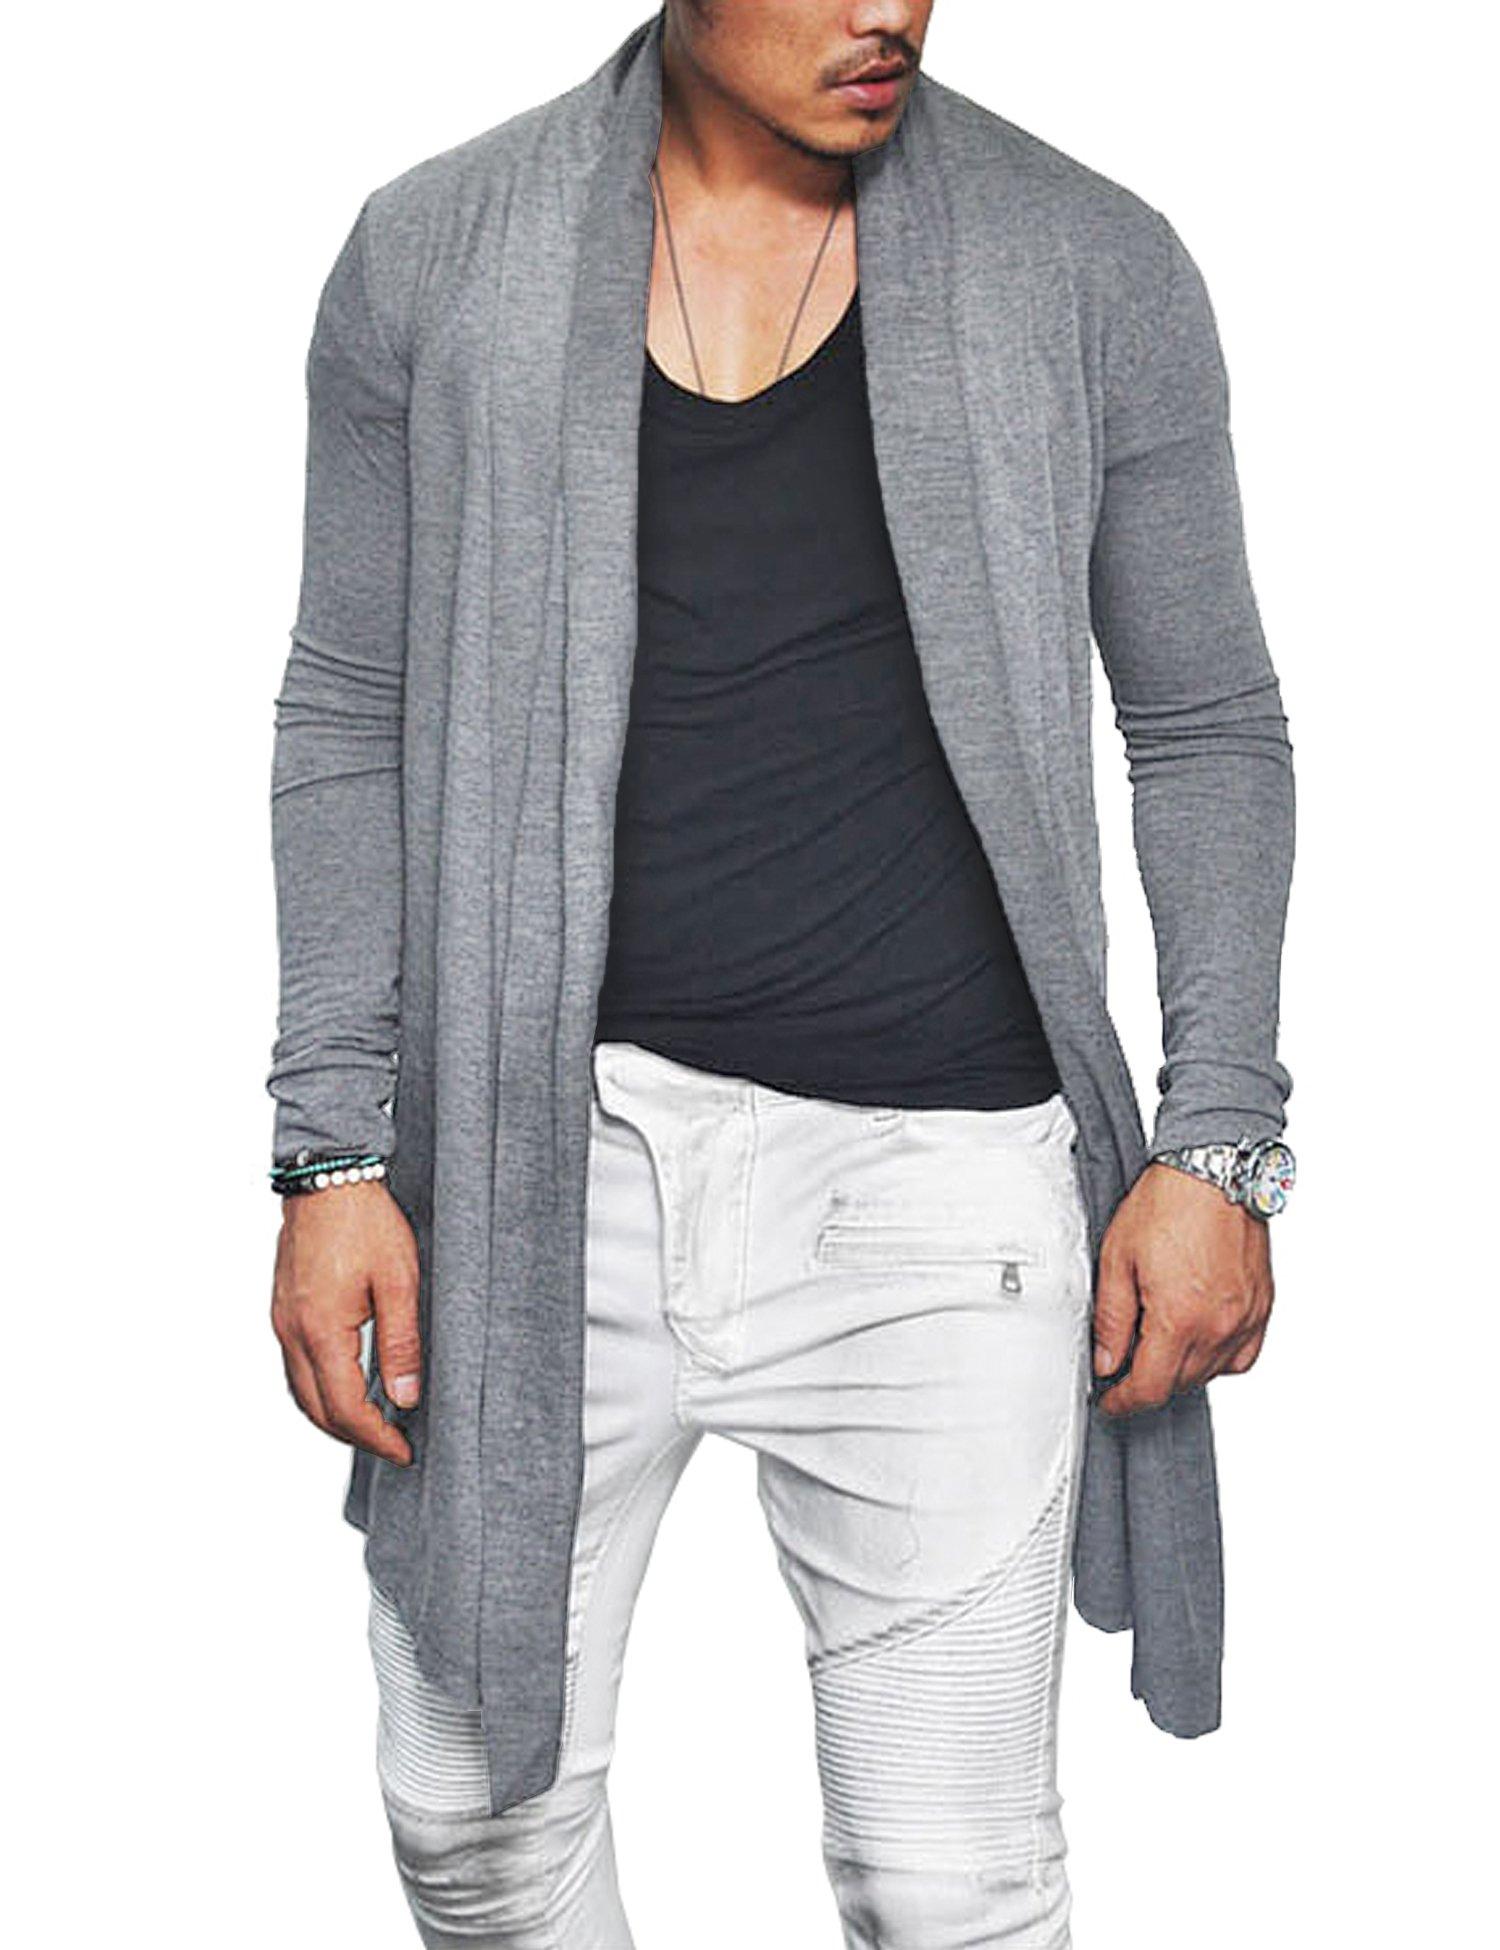 COOFANDY Men's Ruffle Shawl Collar Long Sleeves Cardigan (Medium, Grey)